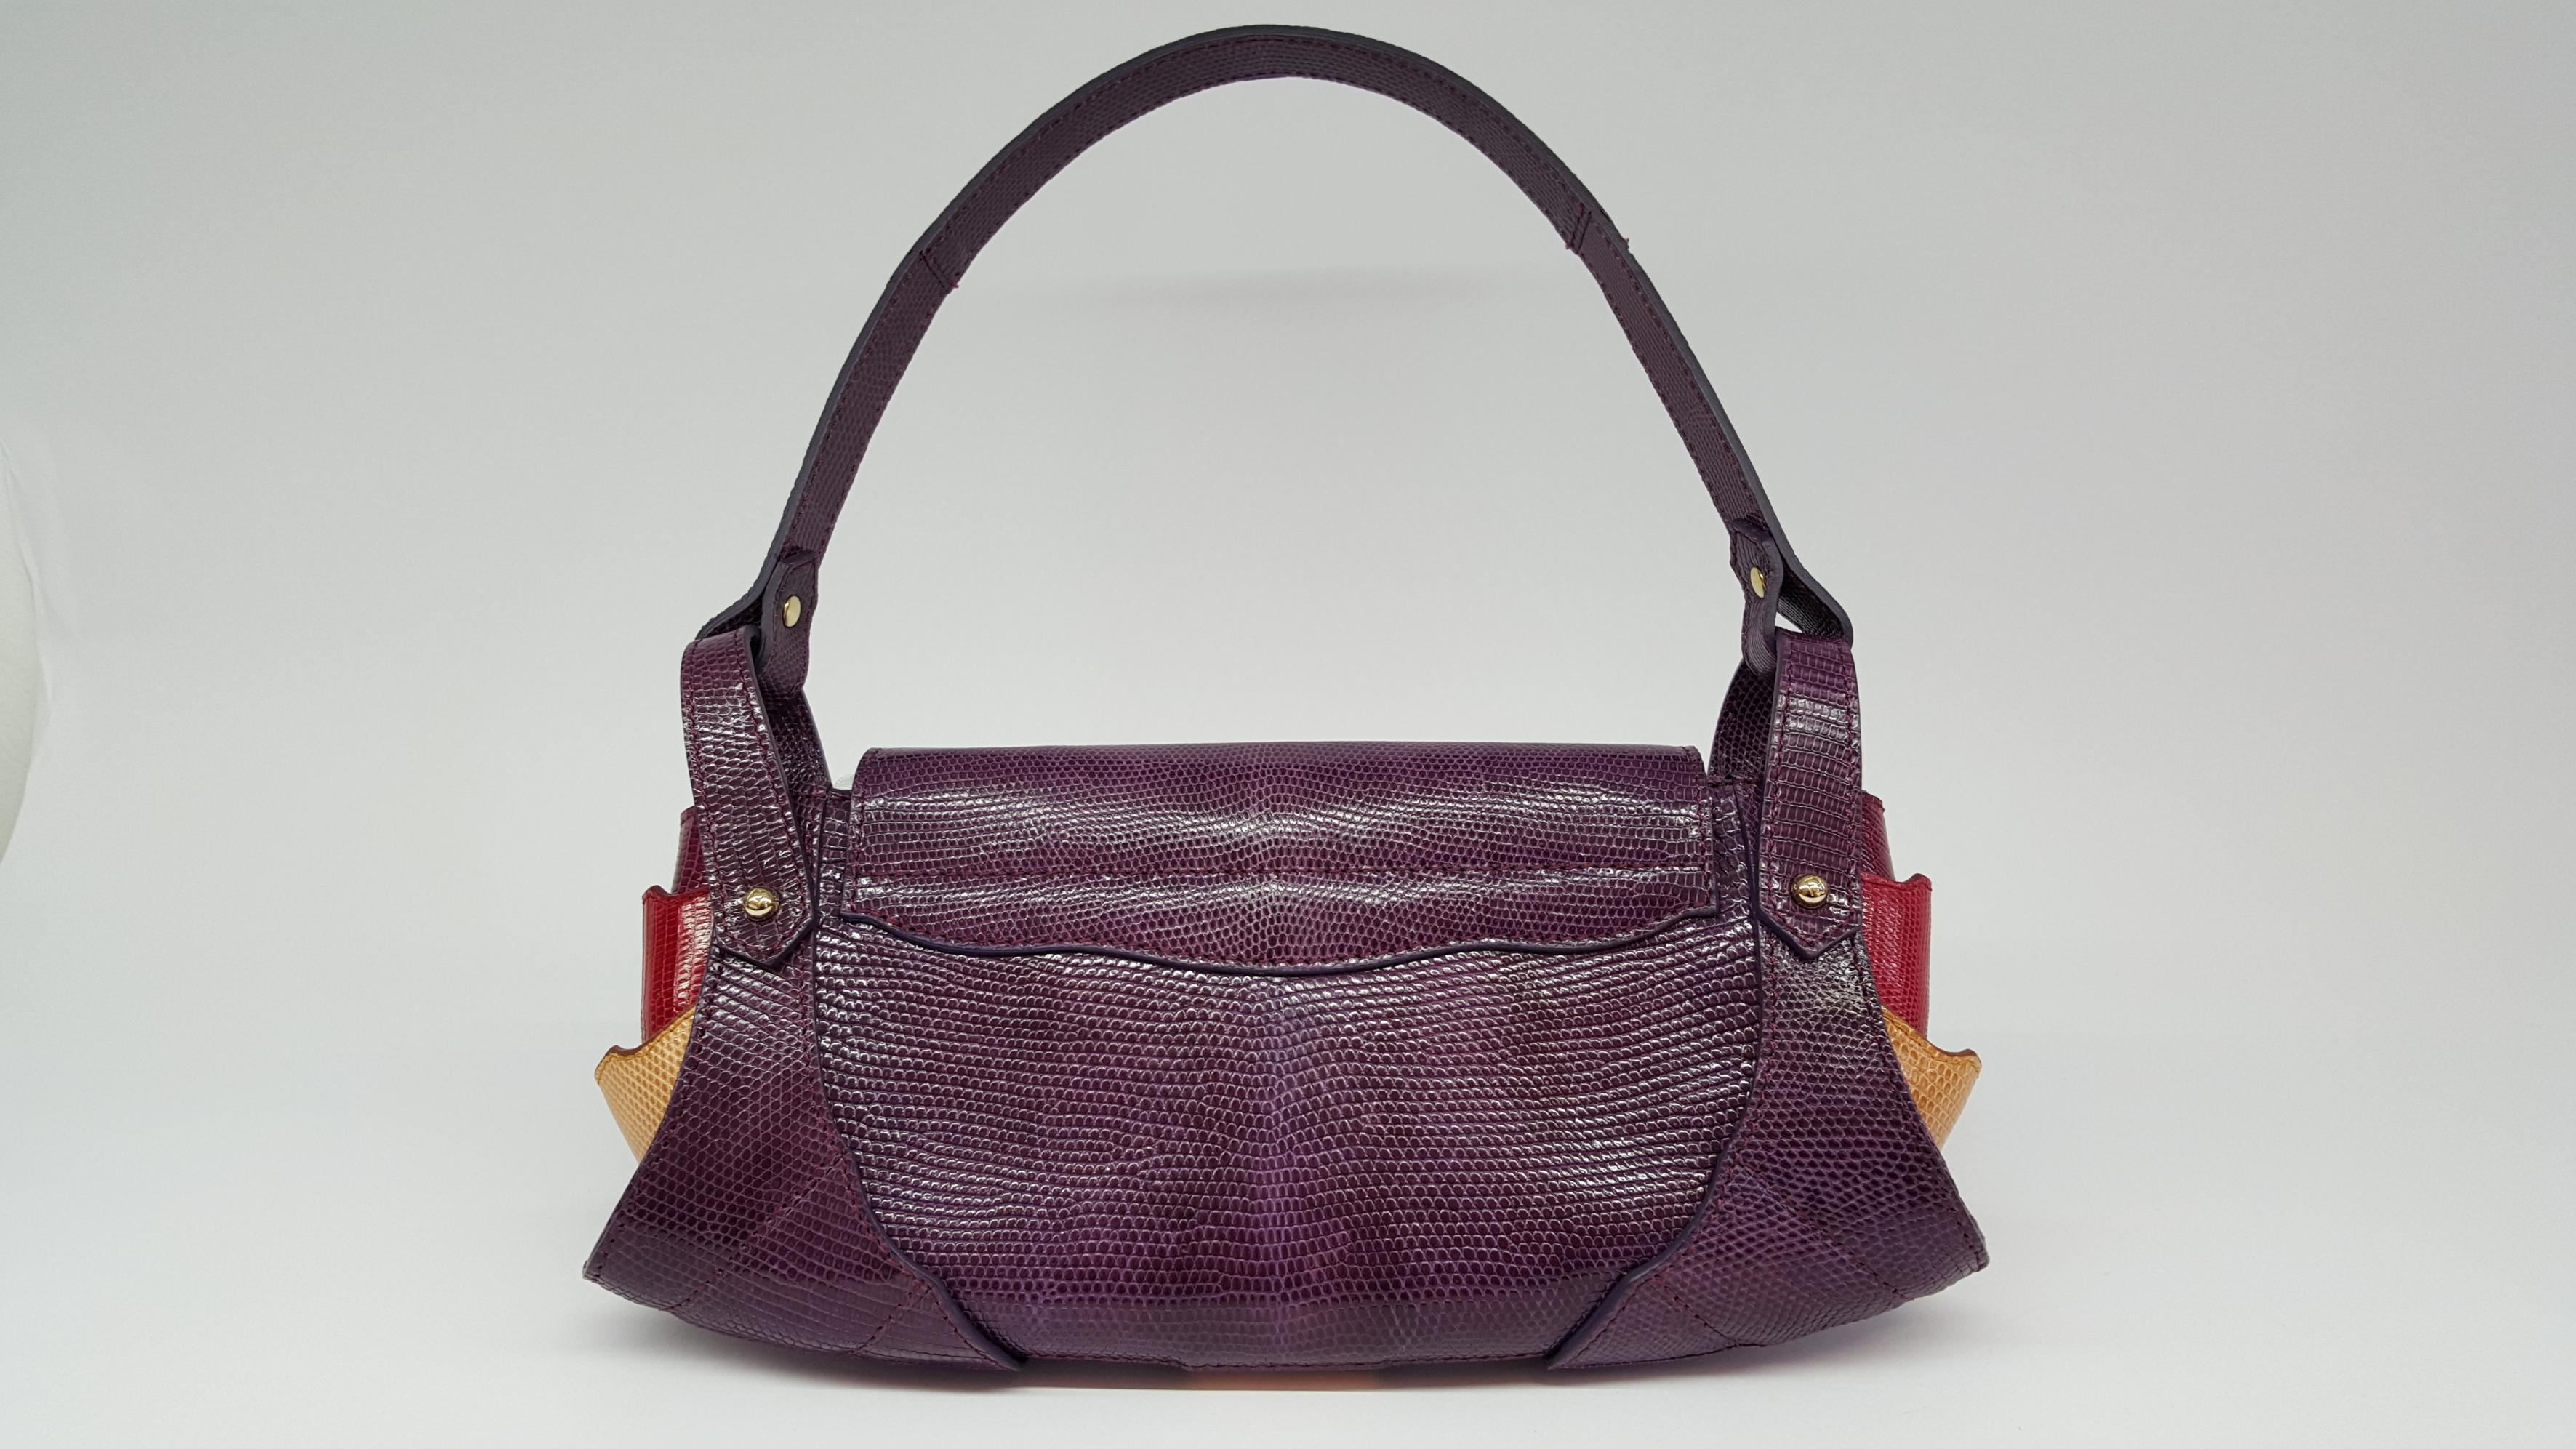 Fendi Lizard Skin Handbag Vintage Shop In Mykonos